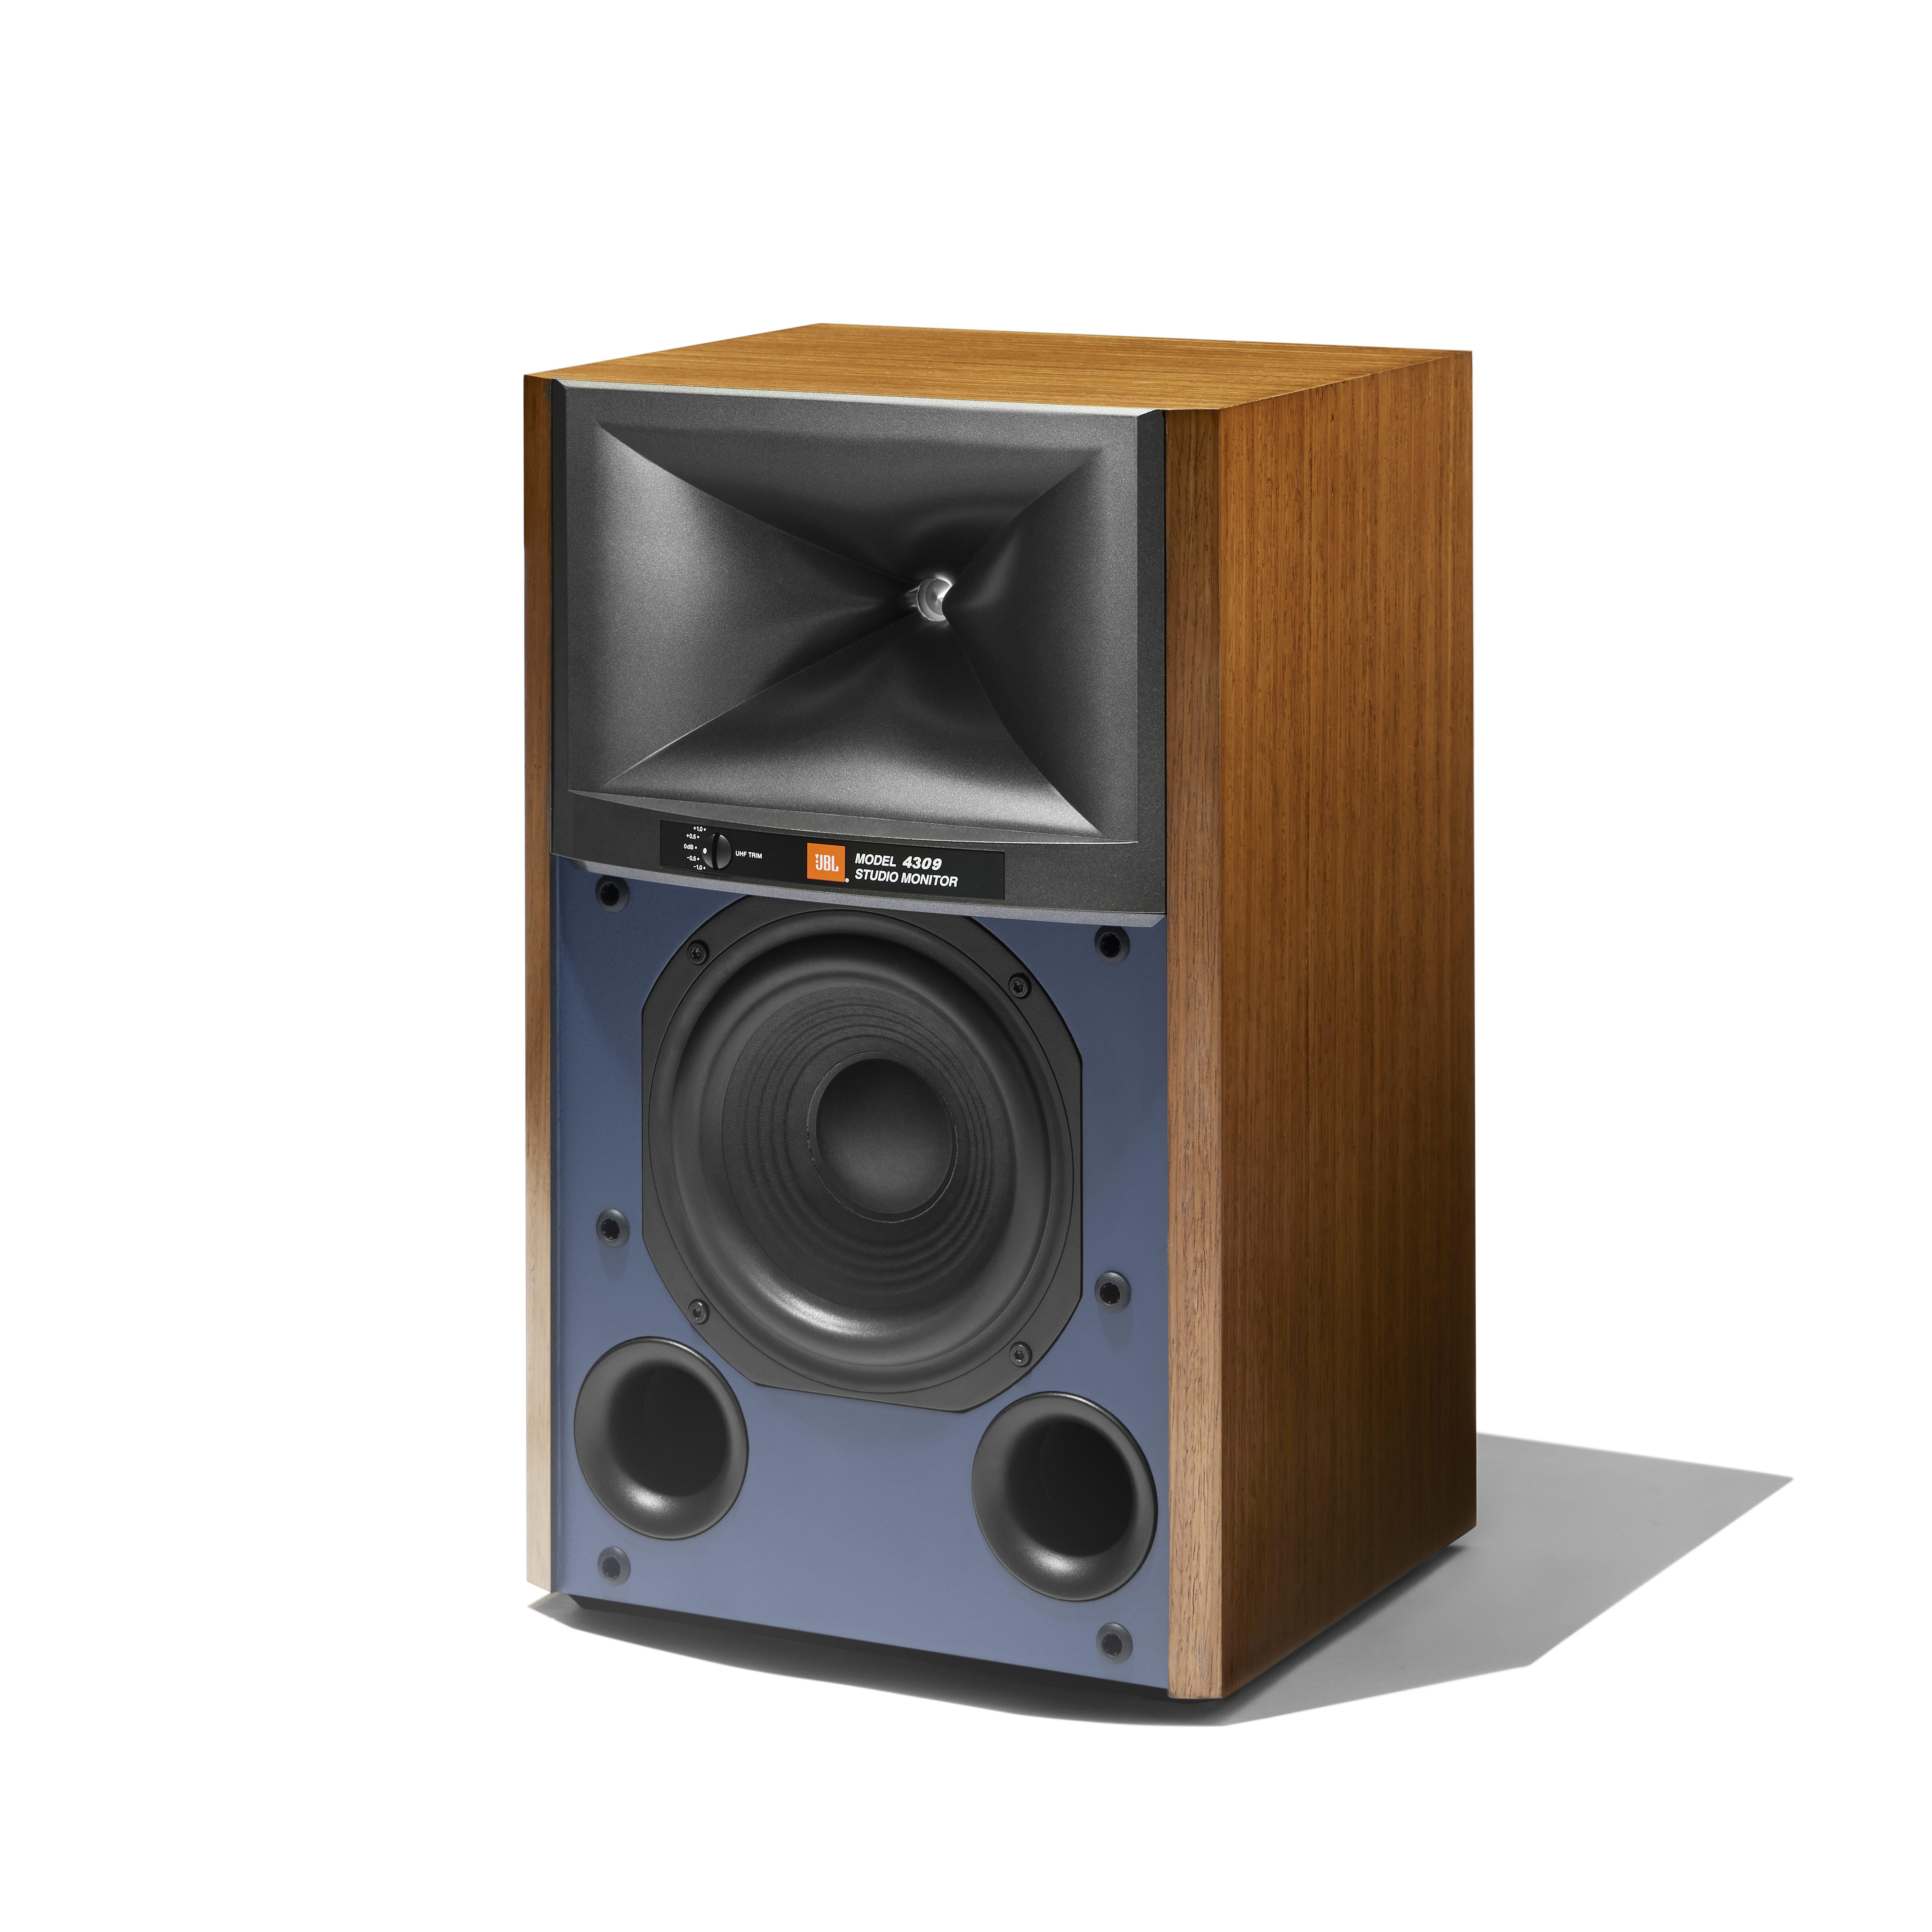 Harman Luxury Audio Packs 75 Years of Acoustic Excellence Into New Compact JBL 4309 Studio Monitor Series Bookshelf Loudspeakers